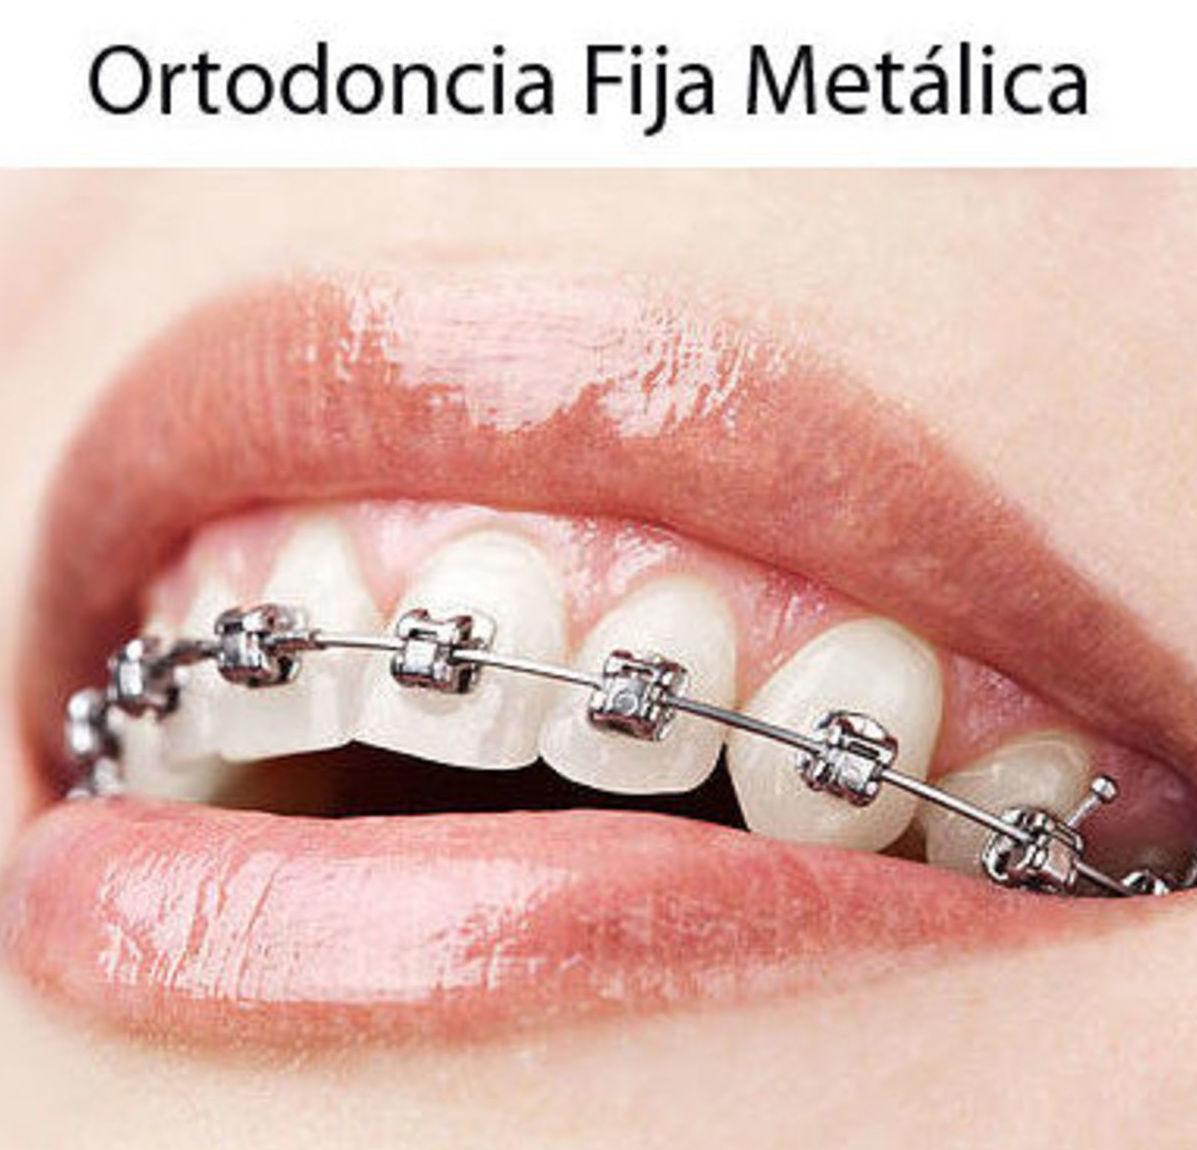 Ortodoncia fija metálica